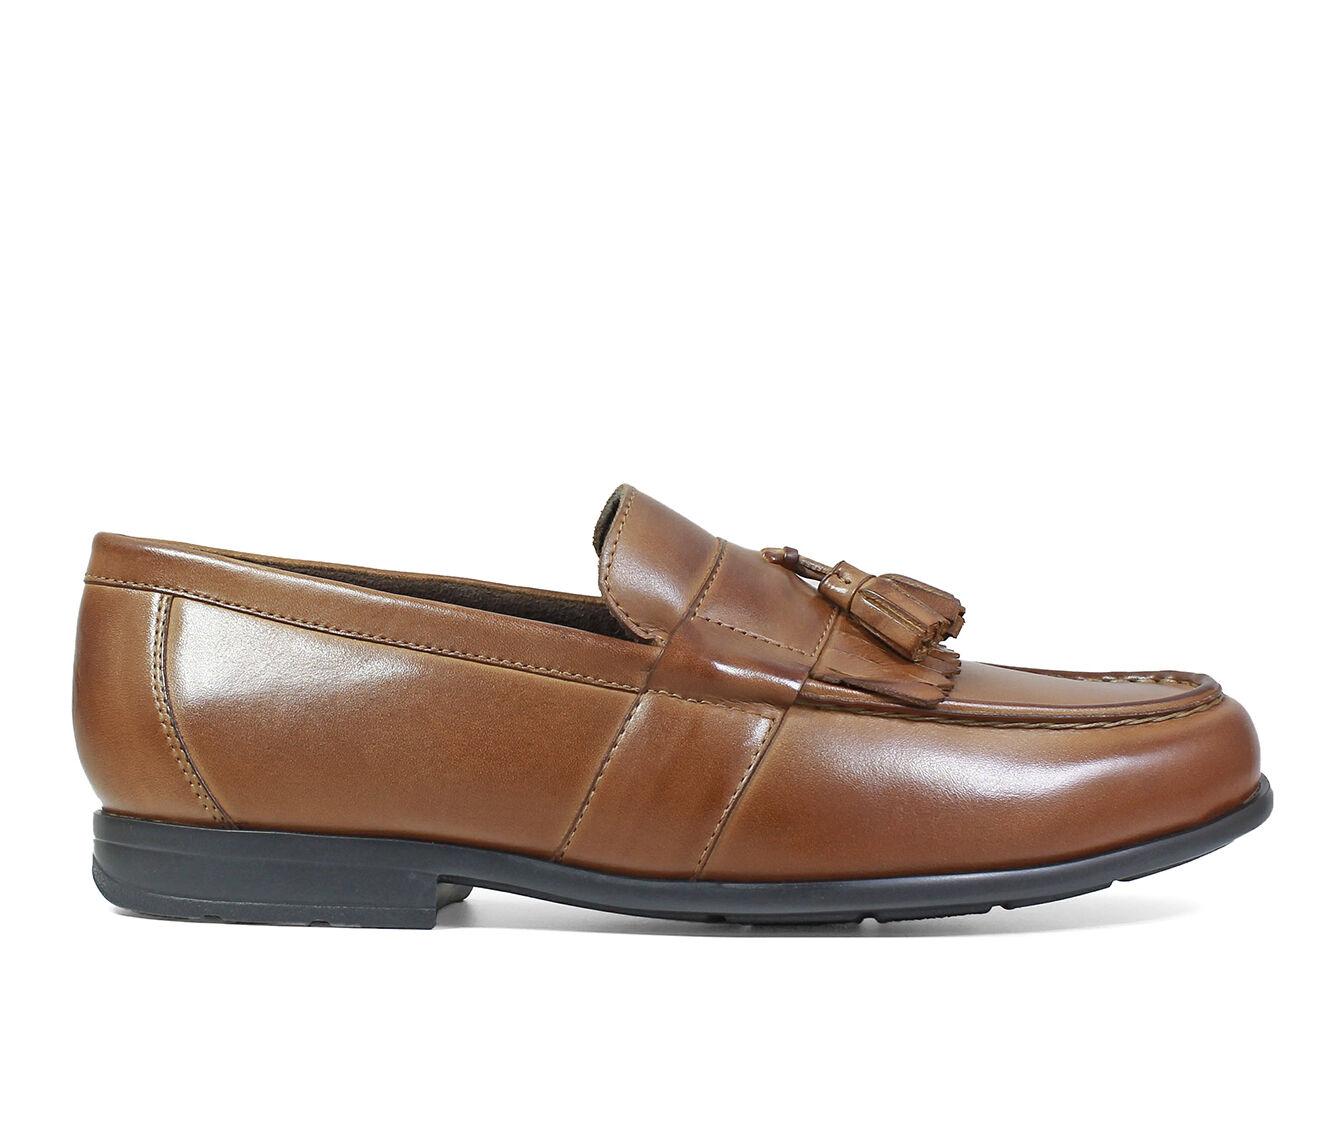 Men's Nunn Bush Denzel Moc Toe Loafers Cognac